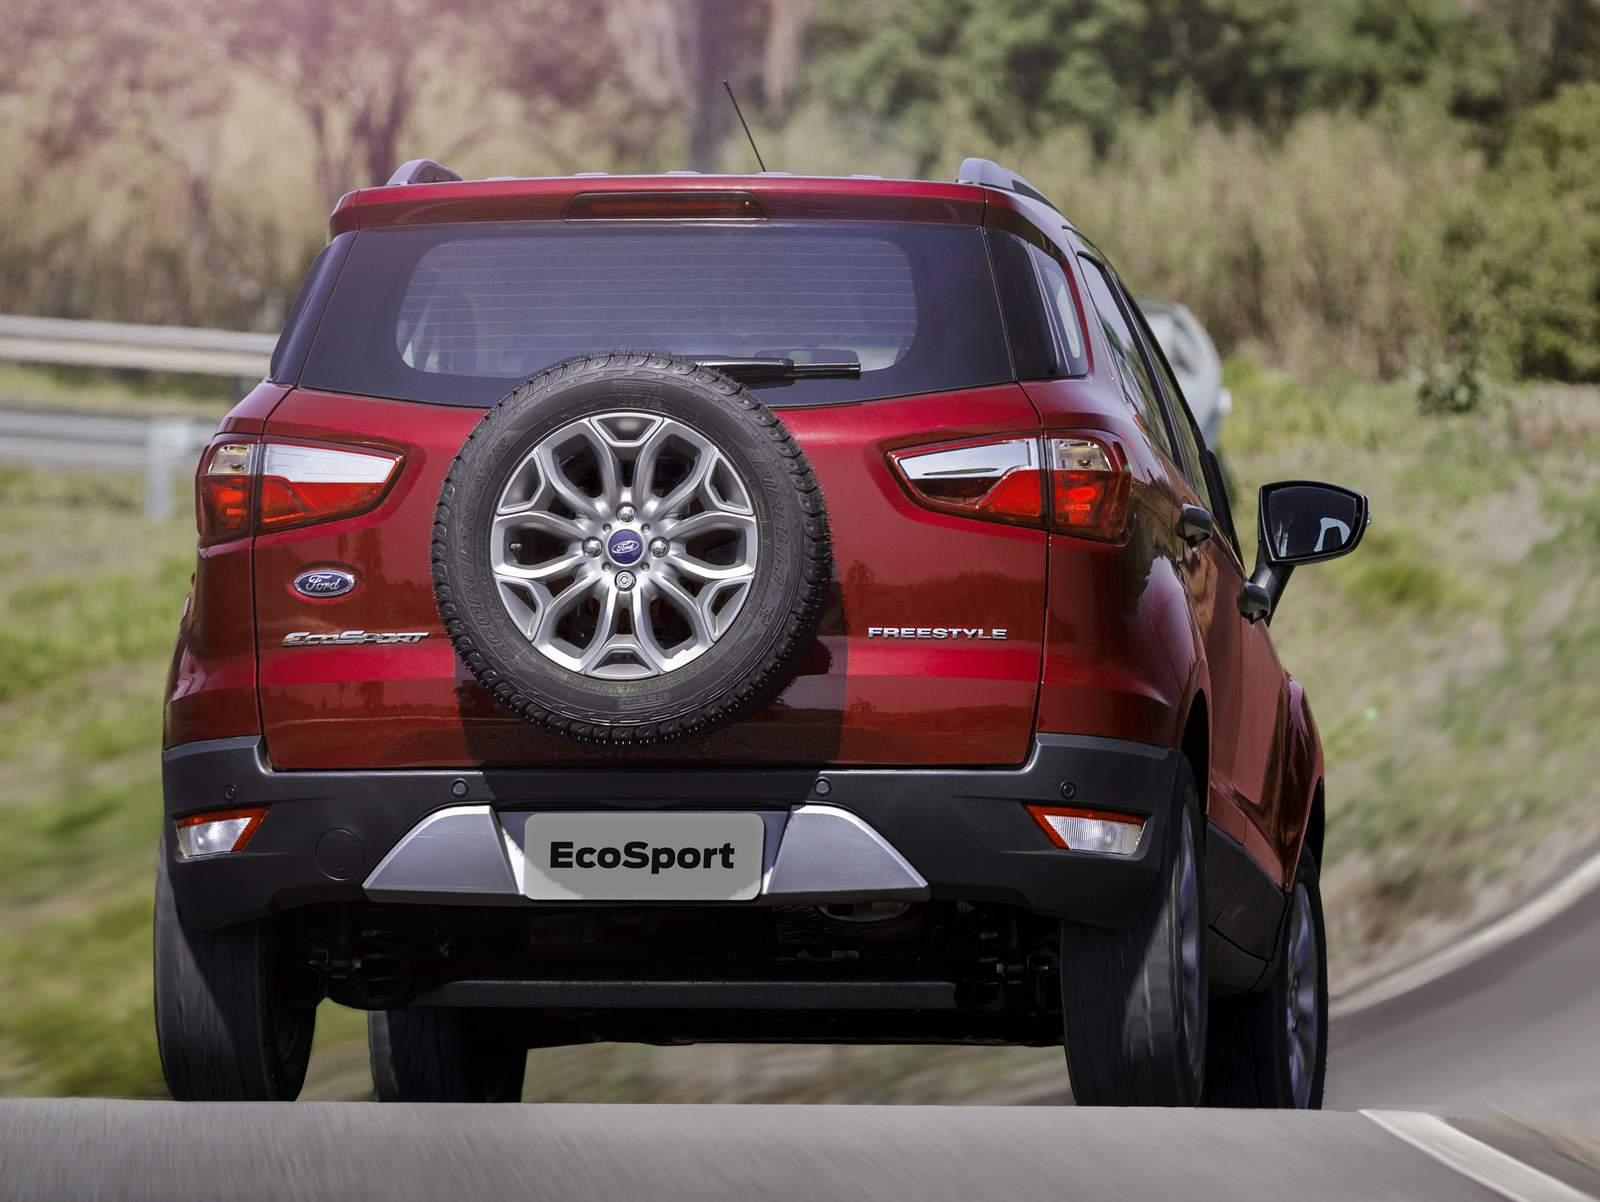 Novo ford ecosport 2016